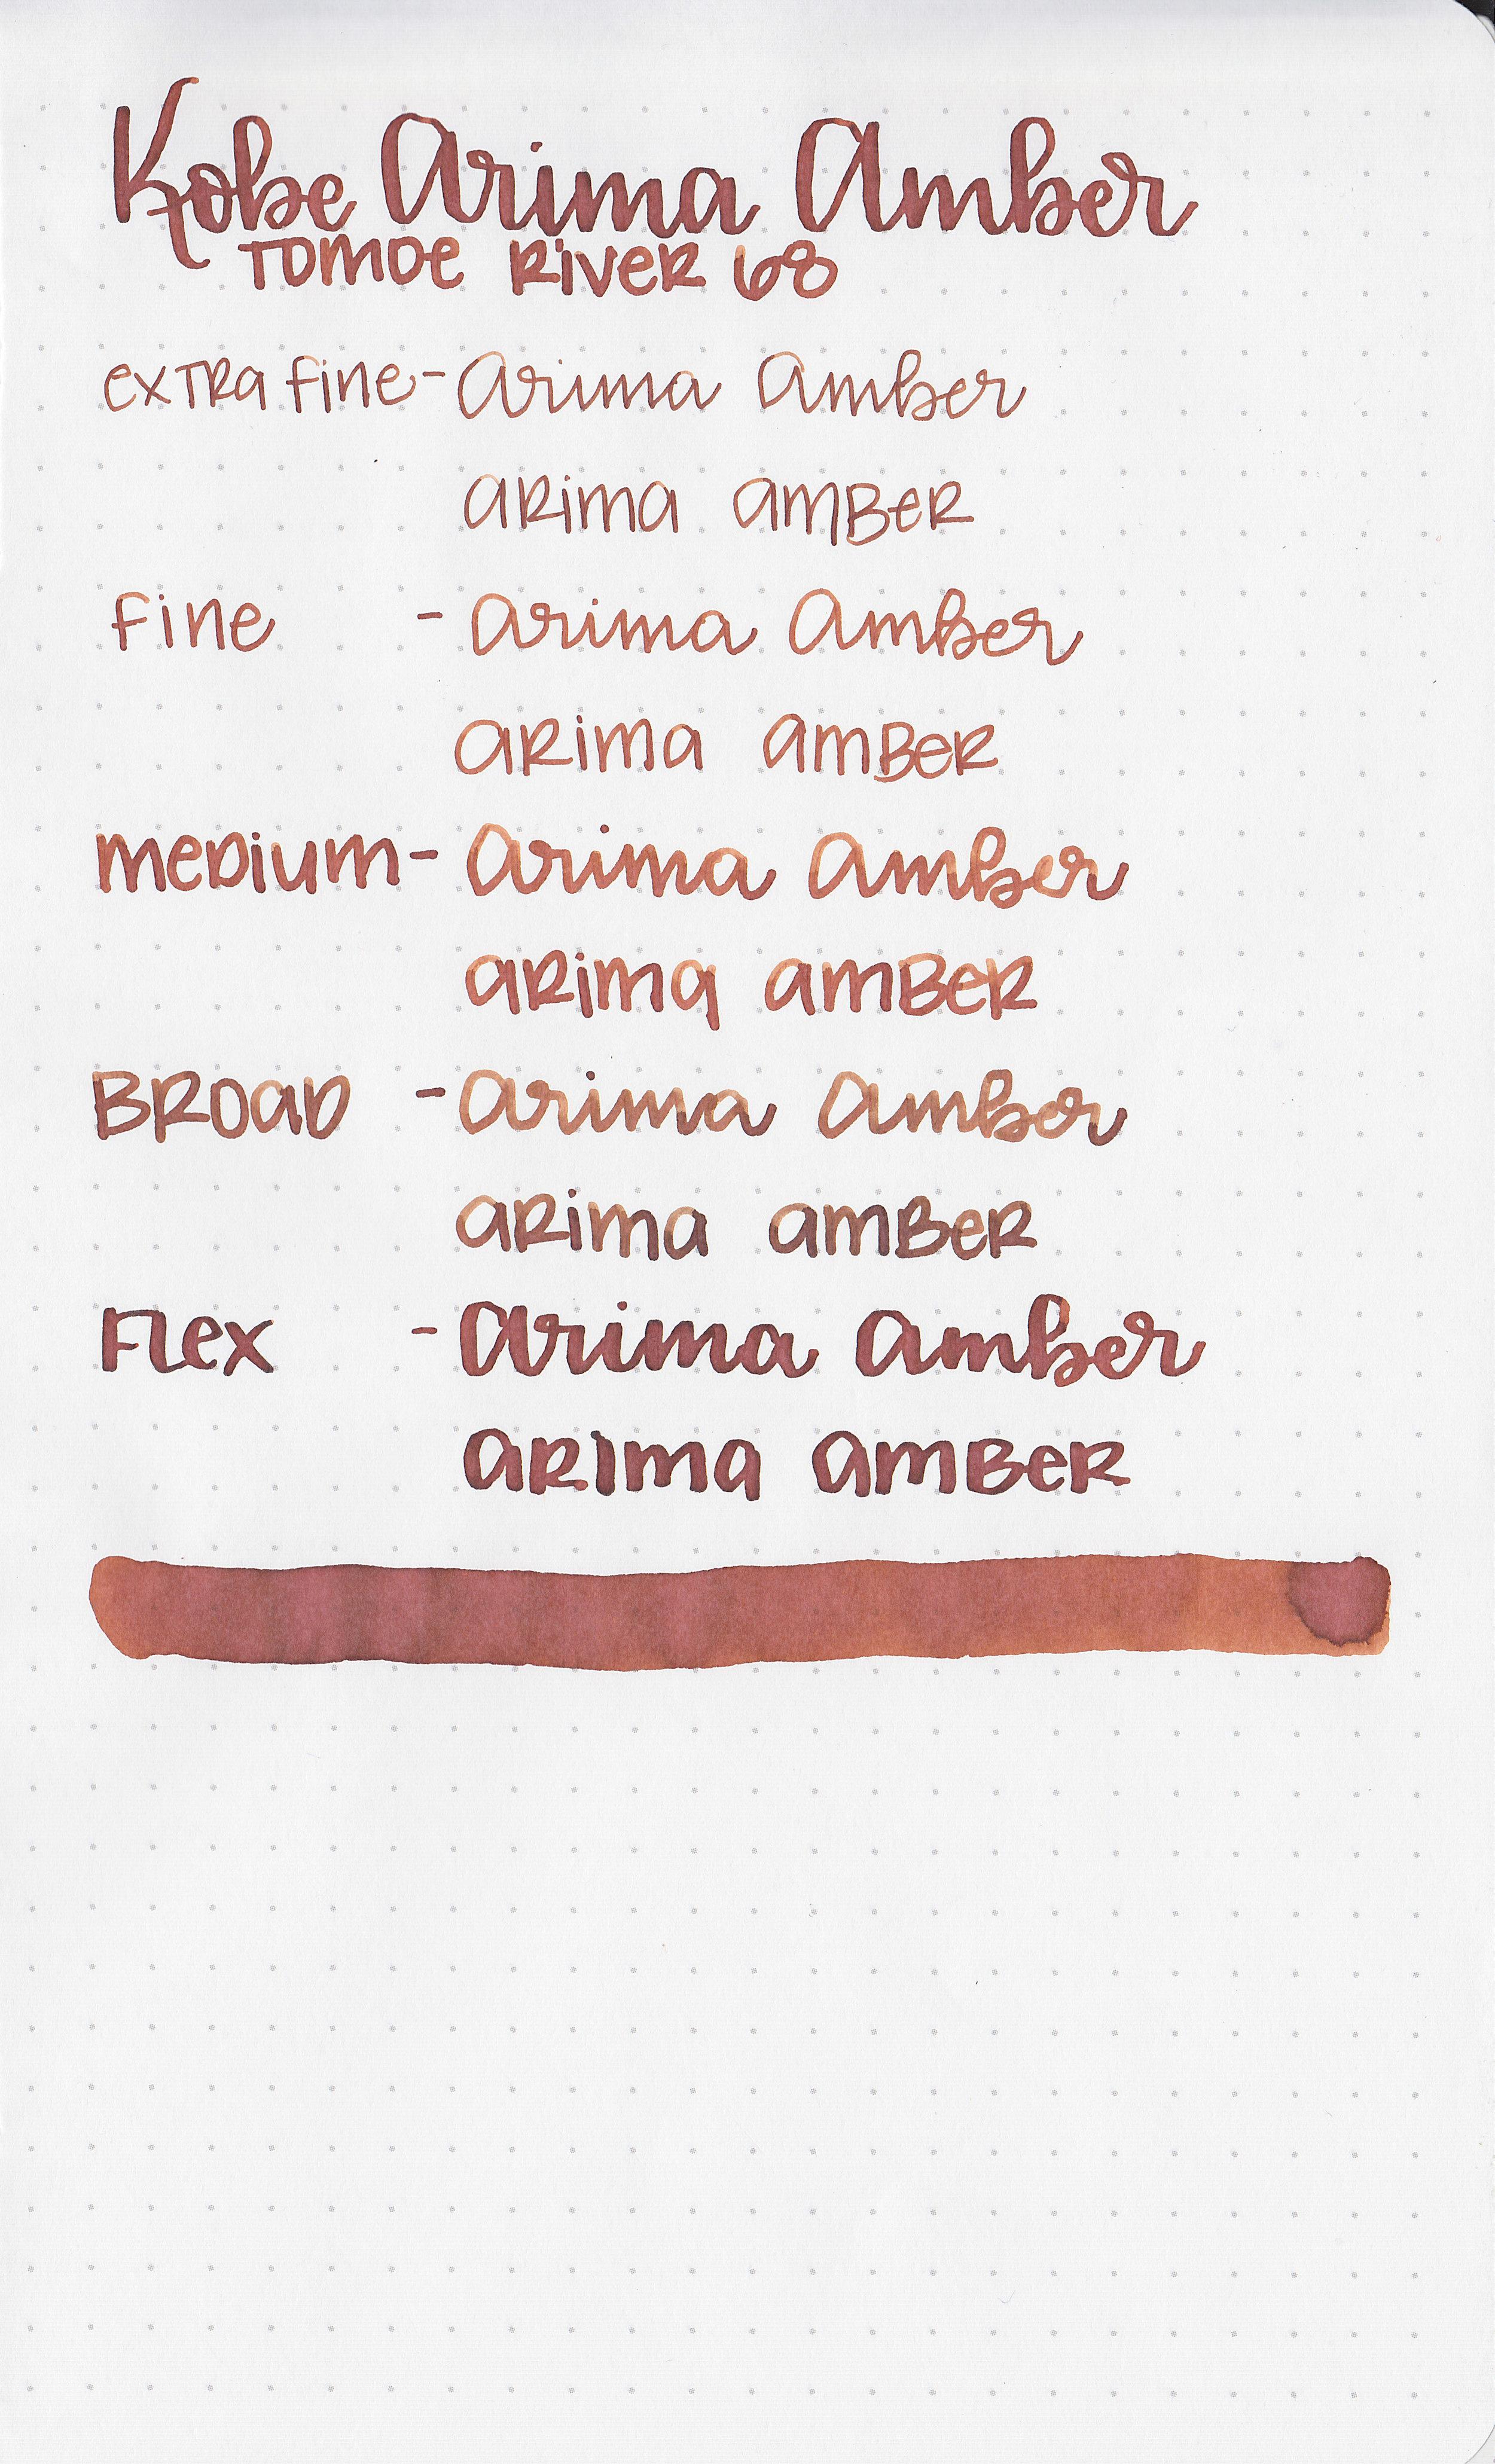 nk-arima-amber-3.jpg